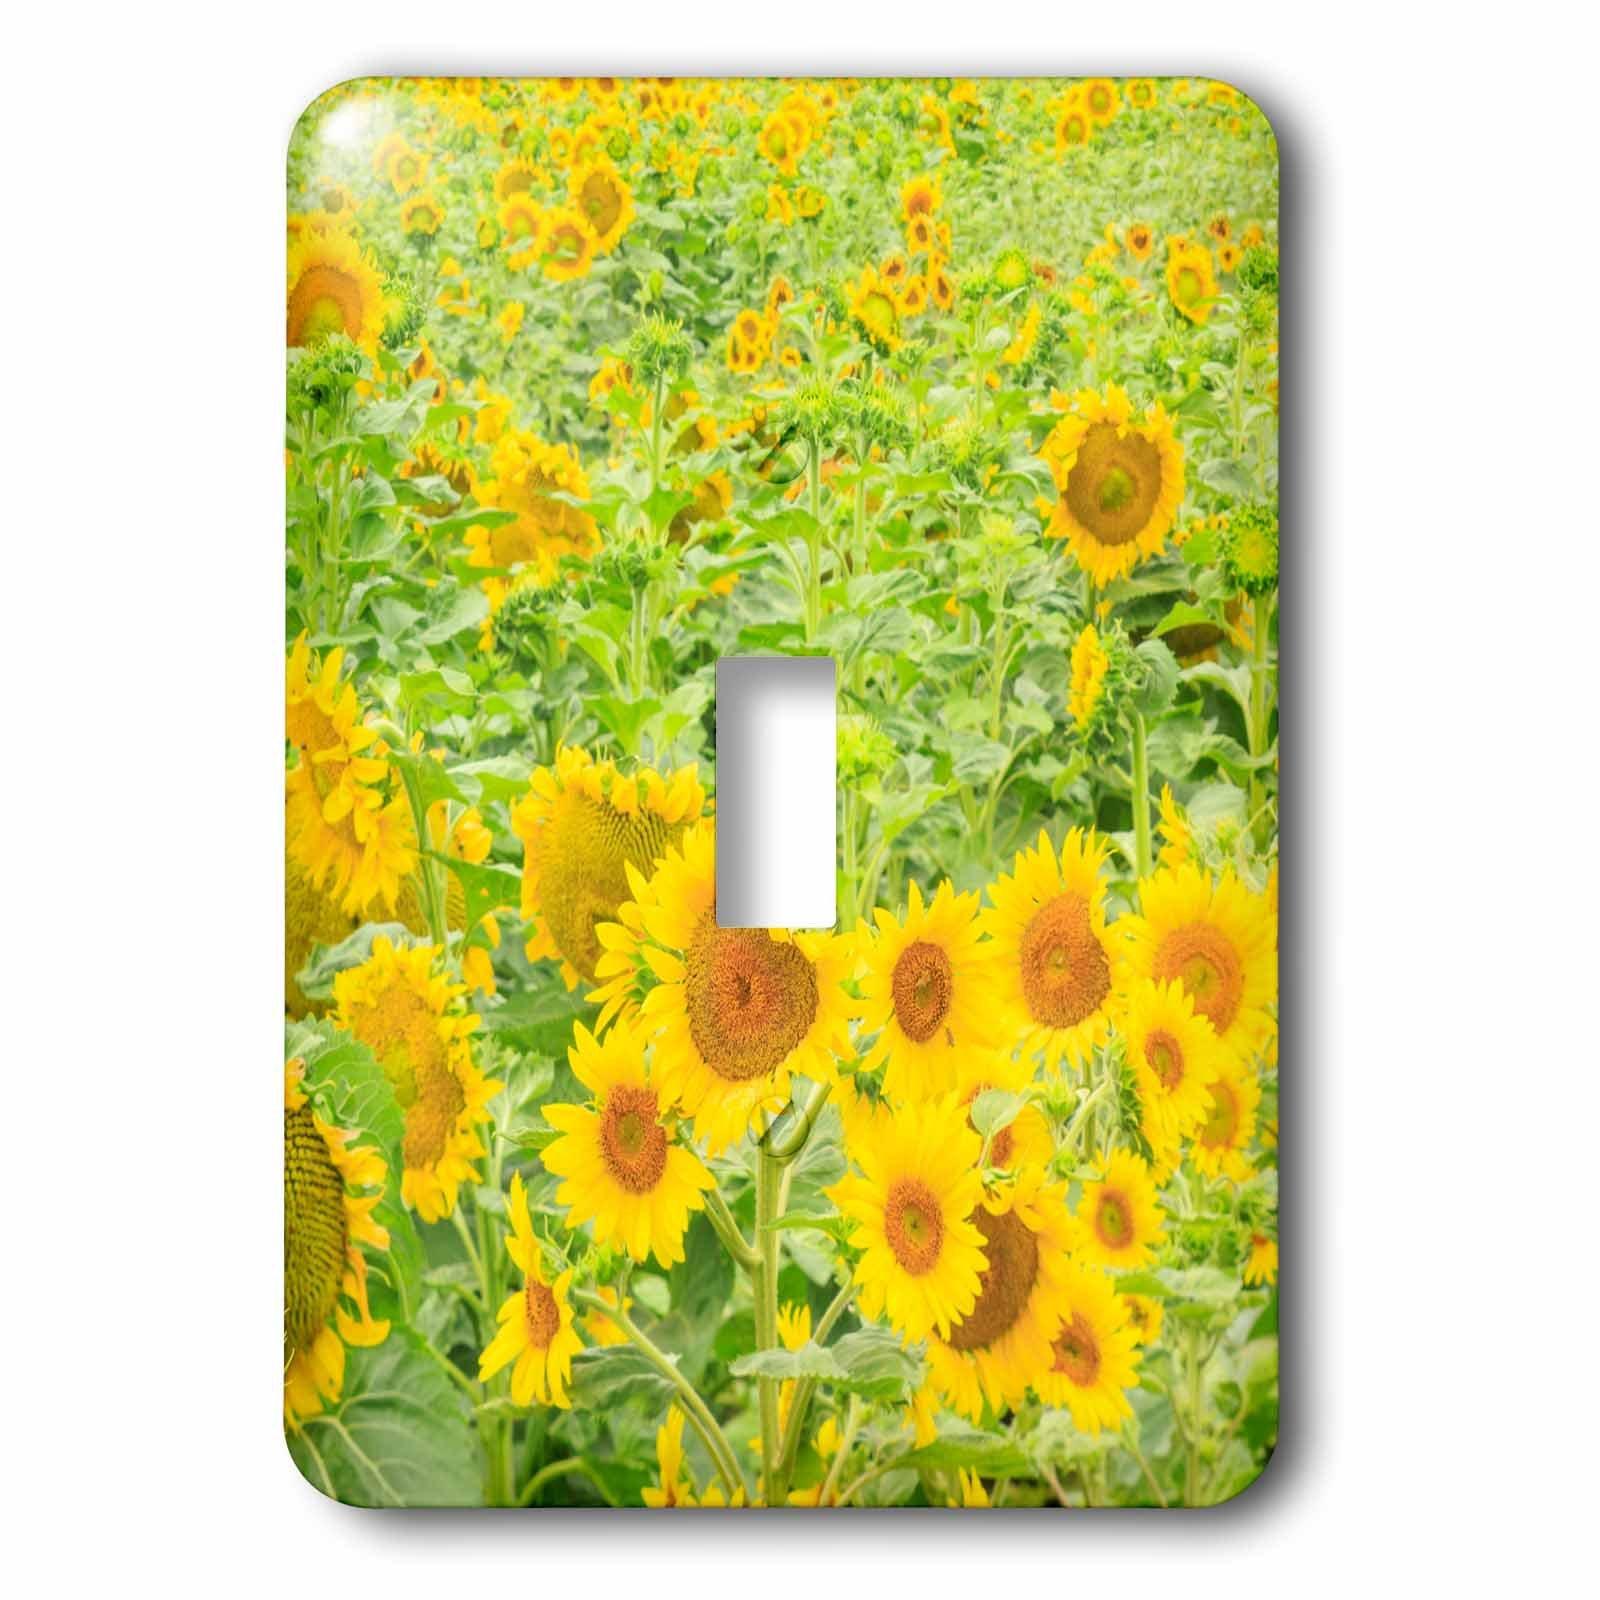 3dRose (lsp_231828_1) Single Toggle Switch (1) Large Field of Sunflowers, Washington State, USA